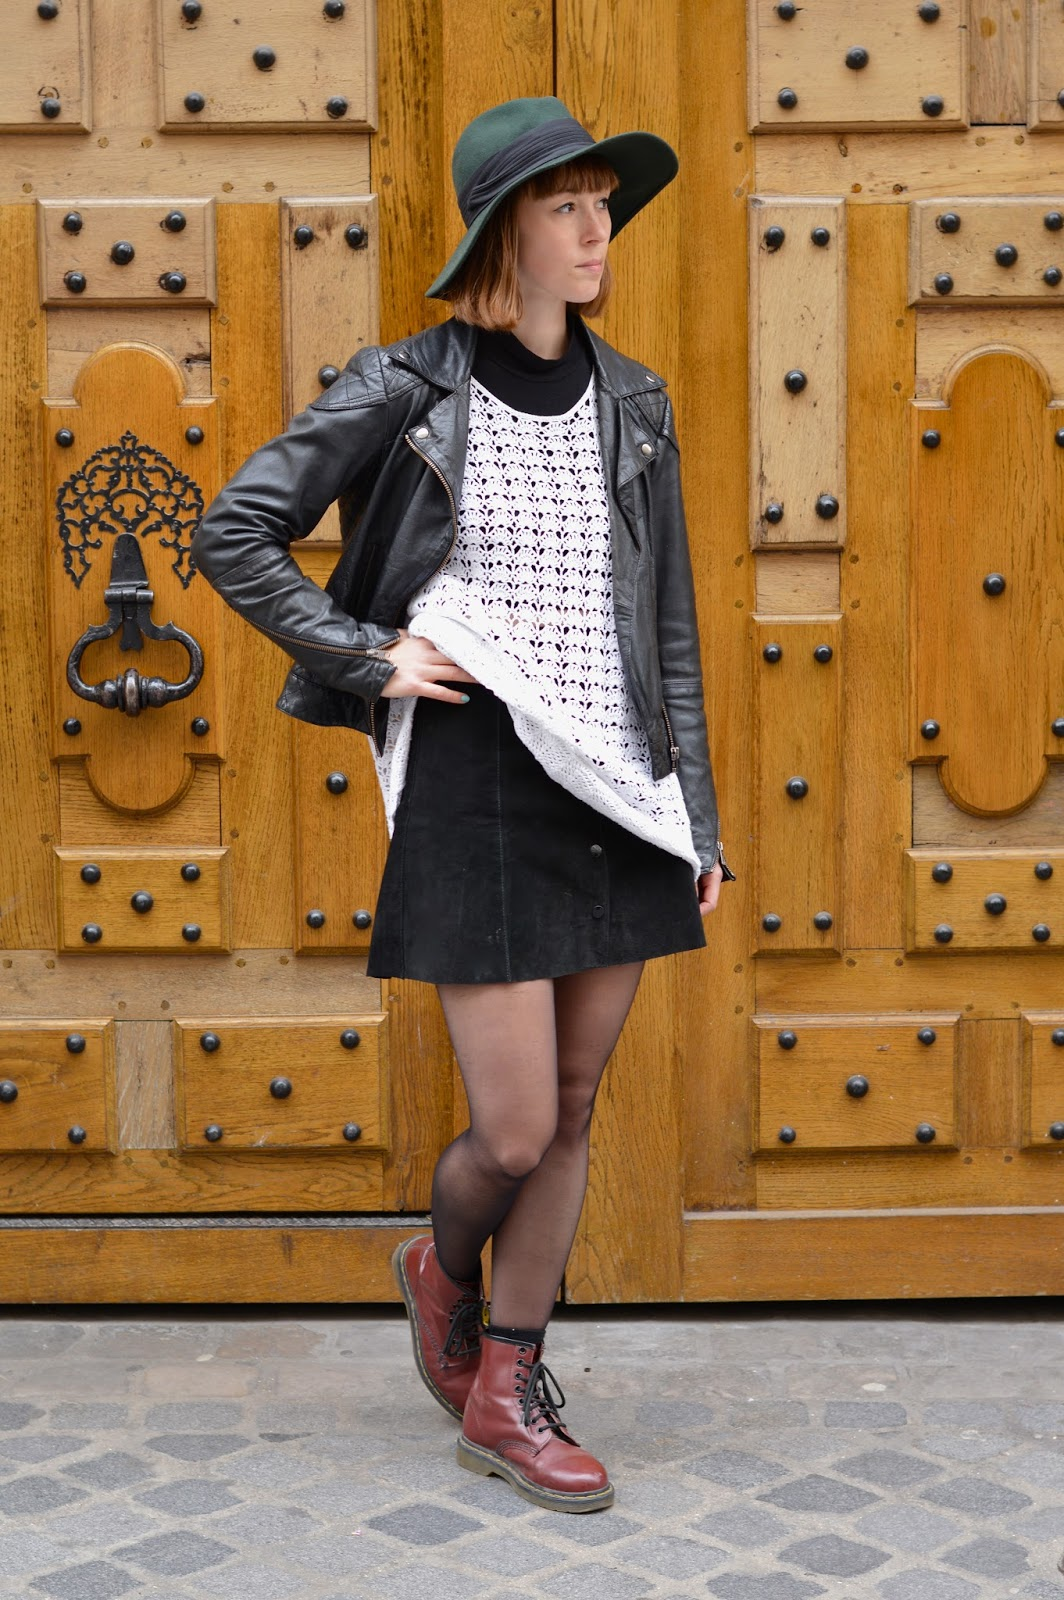 How to wear ss15 seventies trend crochet suede skirt big floppy hat